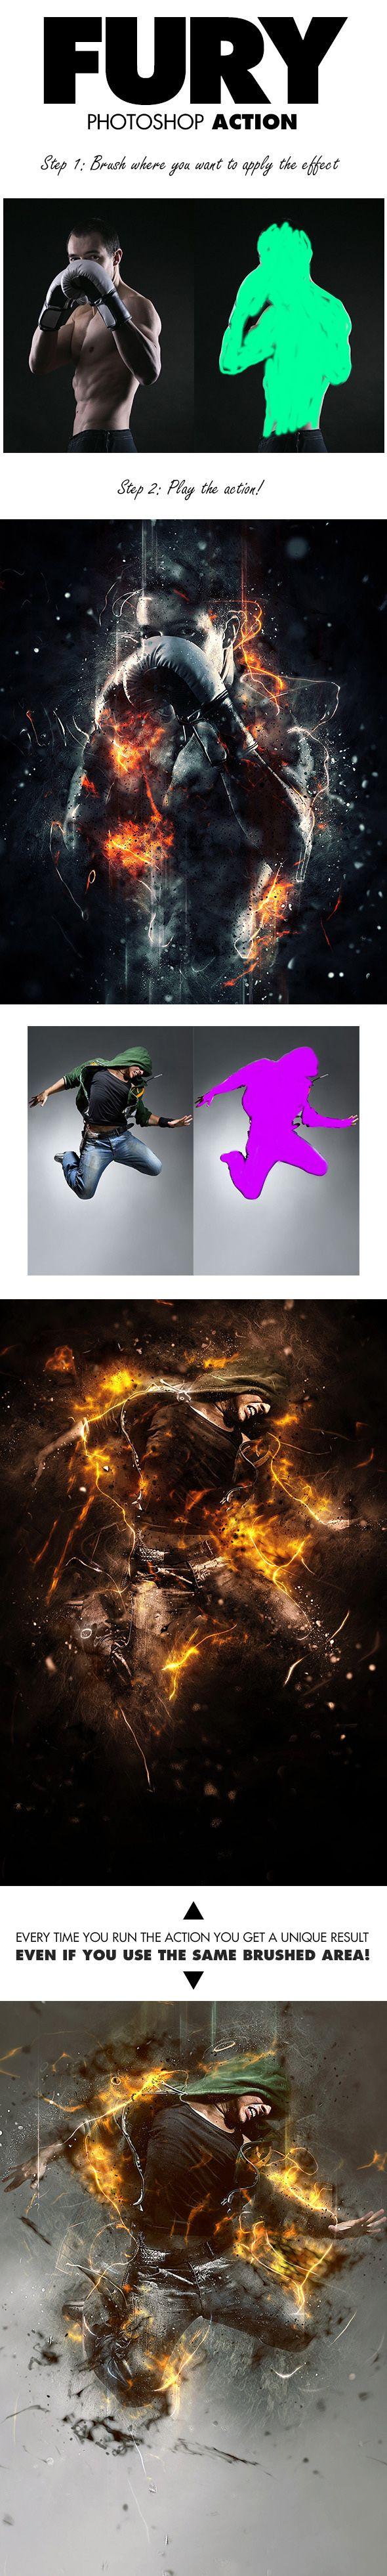 7-Fury Photoshop Action